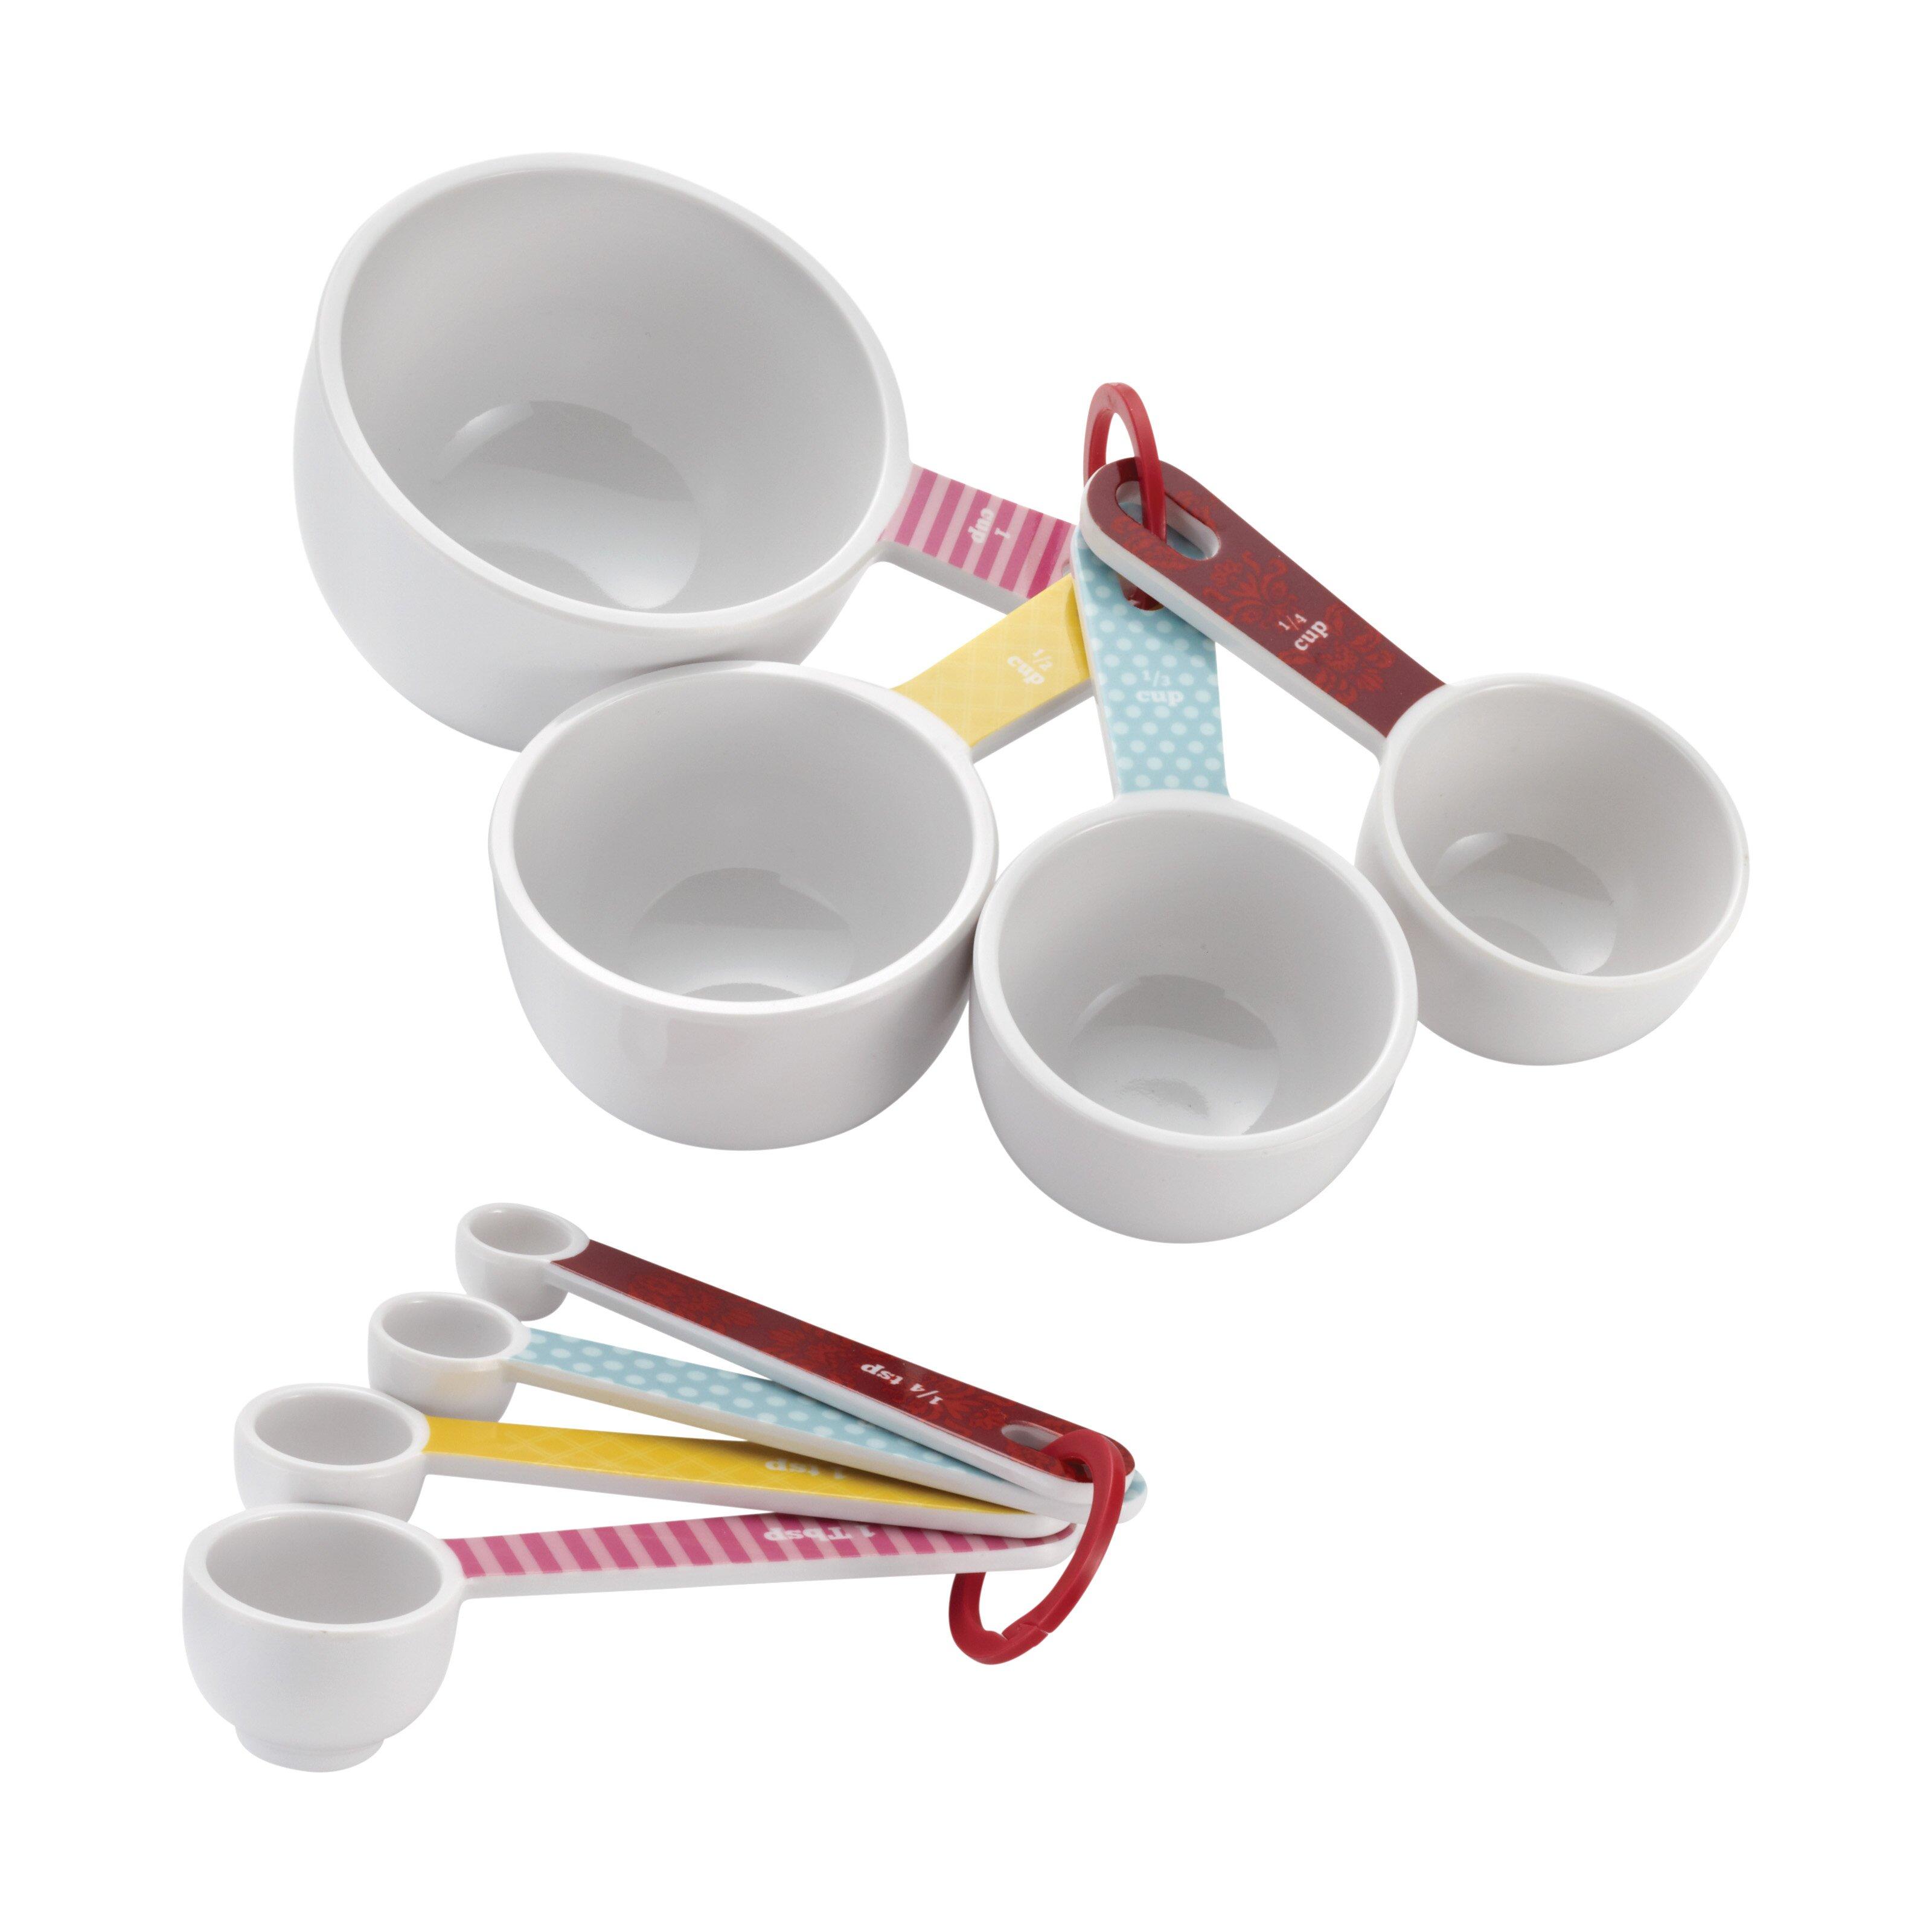 cake boss 8 piece measuring cup spoon set reviews wayfair. Black Bedroom Furniture Sets. Home Design Ideas